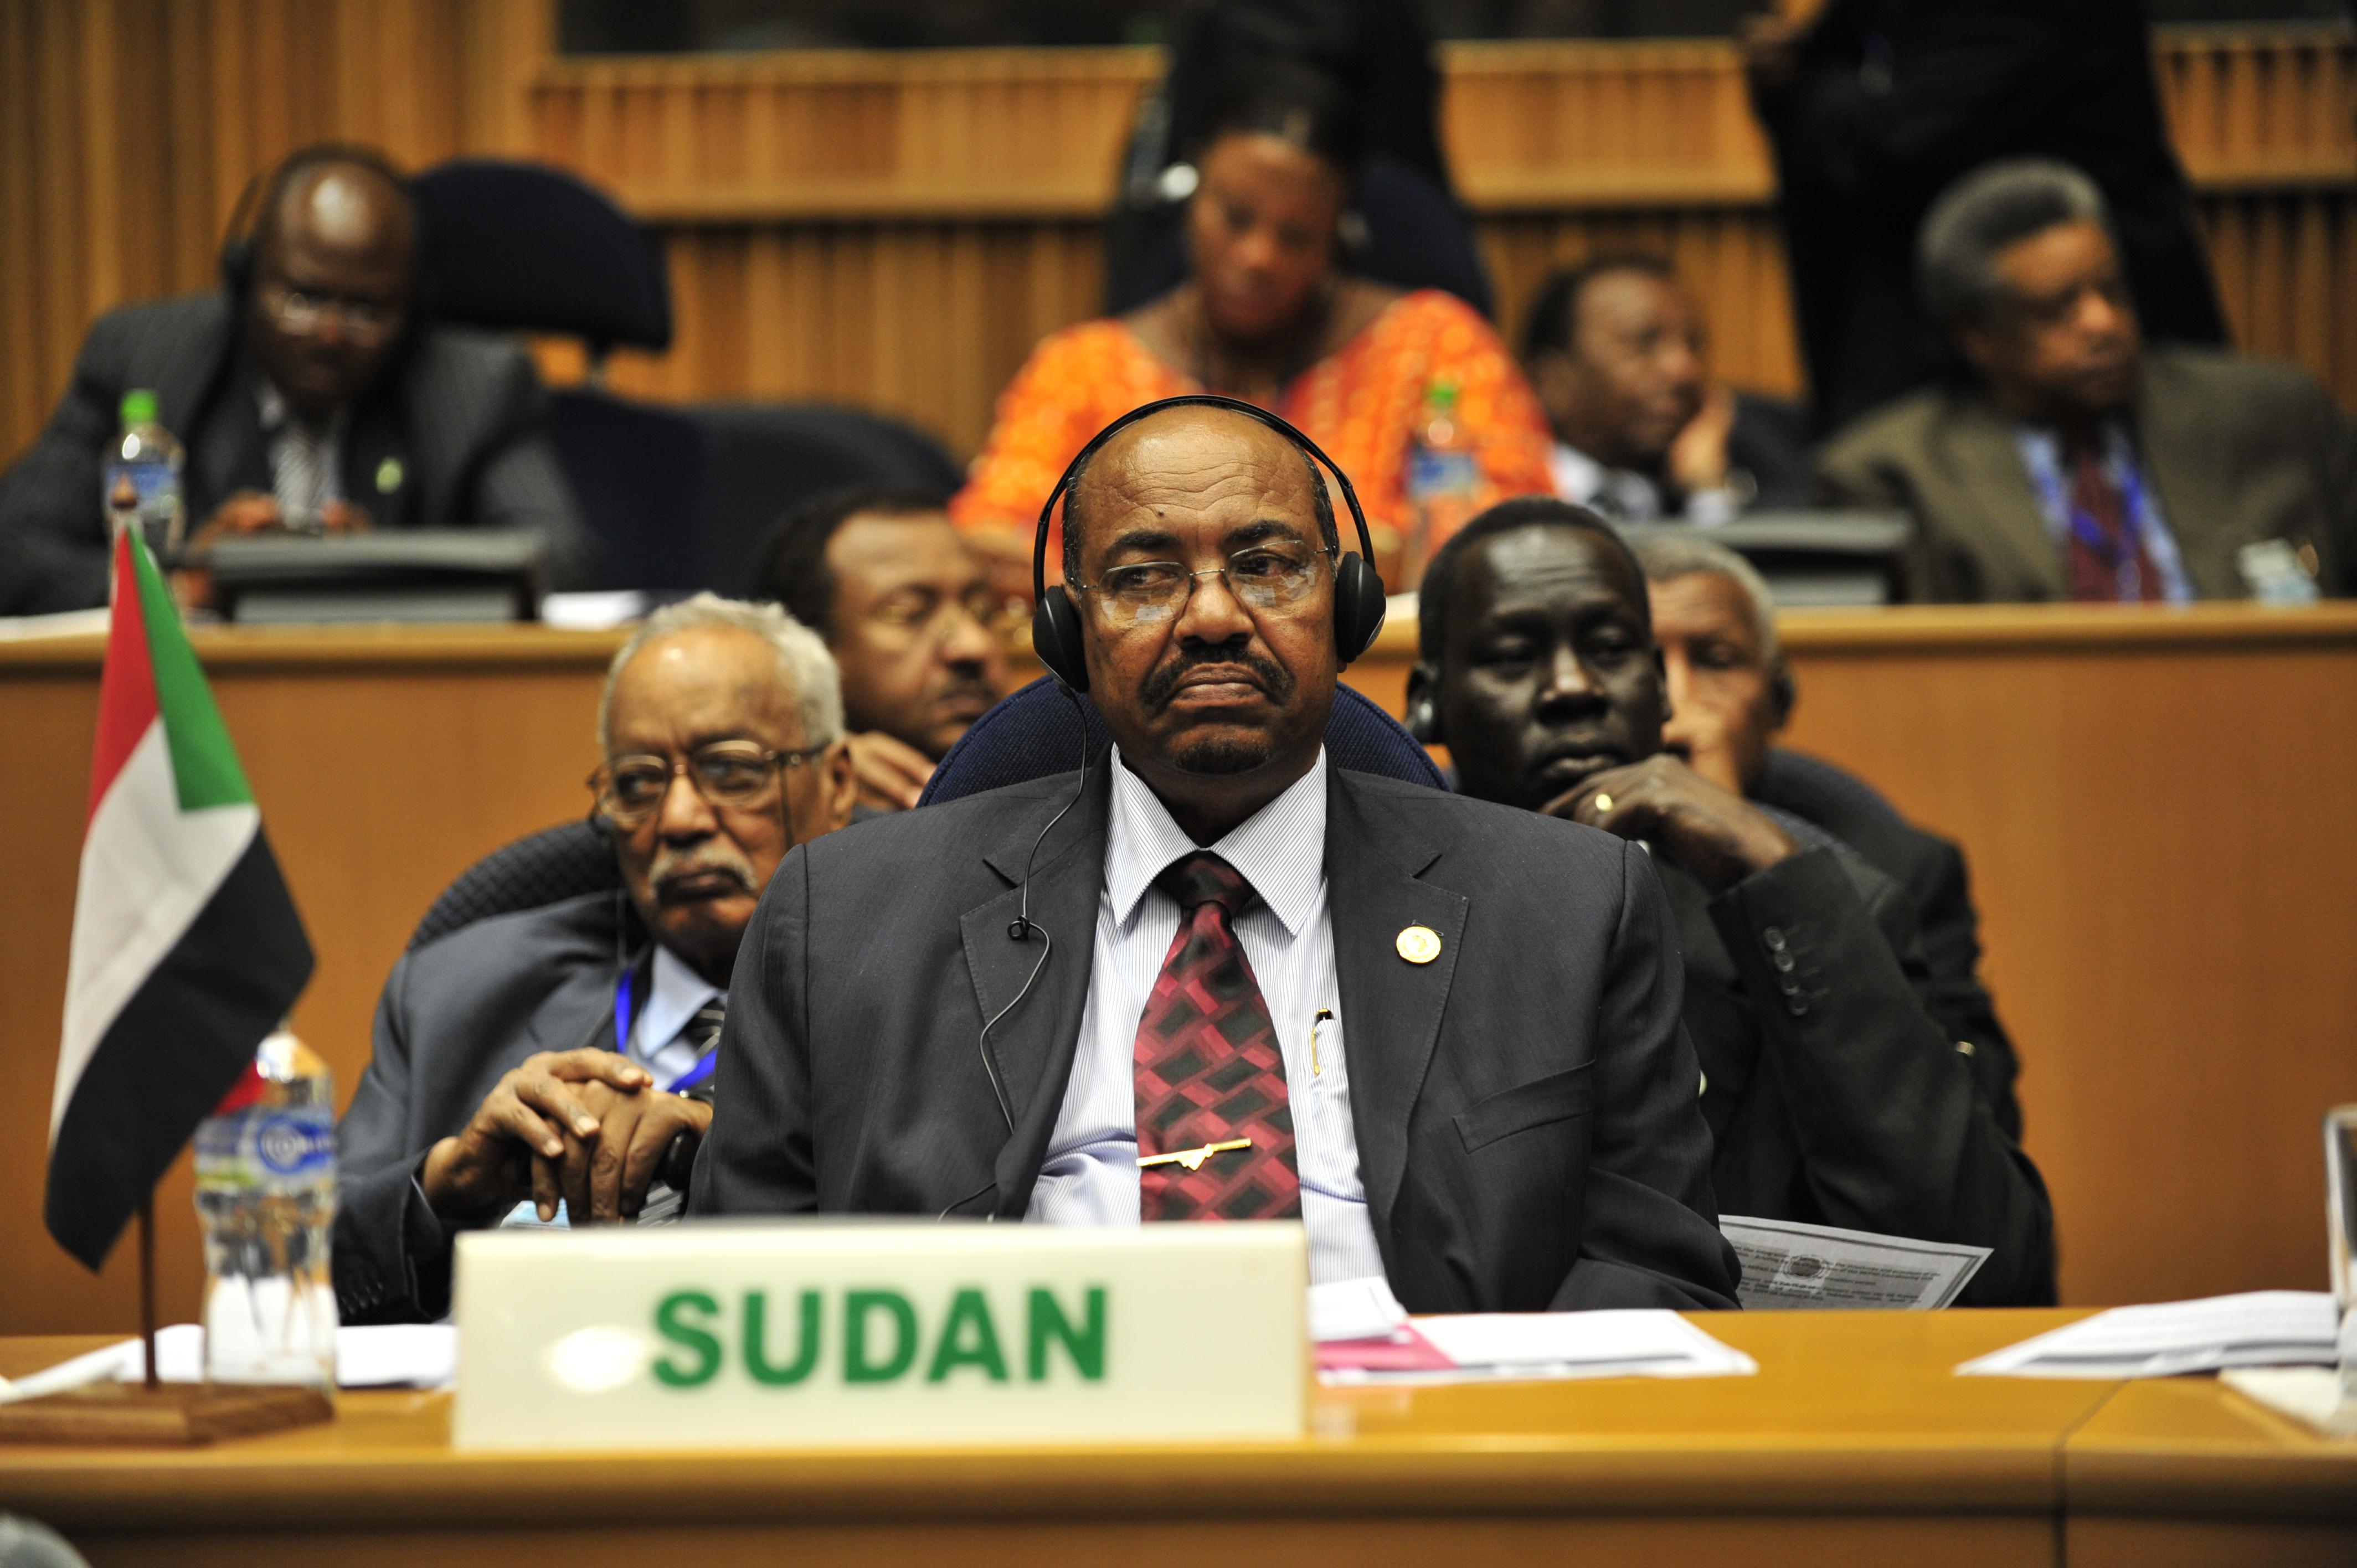 Sudan prosecutor announces investigation of Darfur war crimes